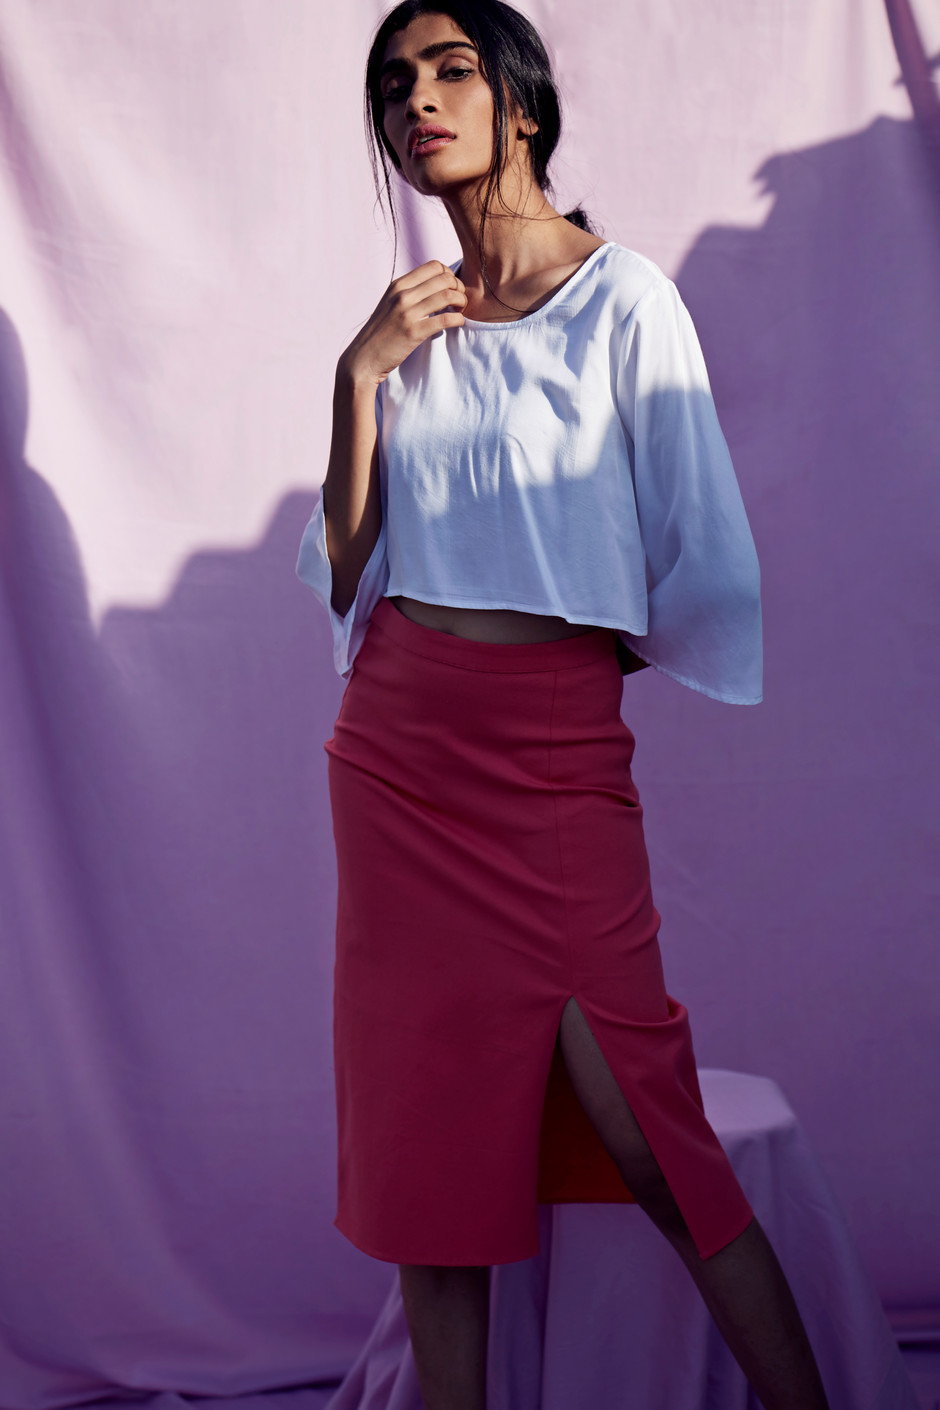 LEYAN Blouse & SEFA Skirt